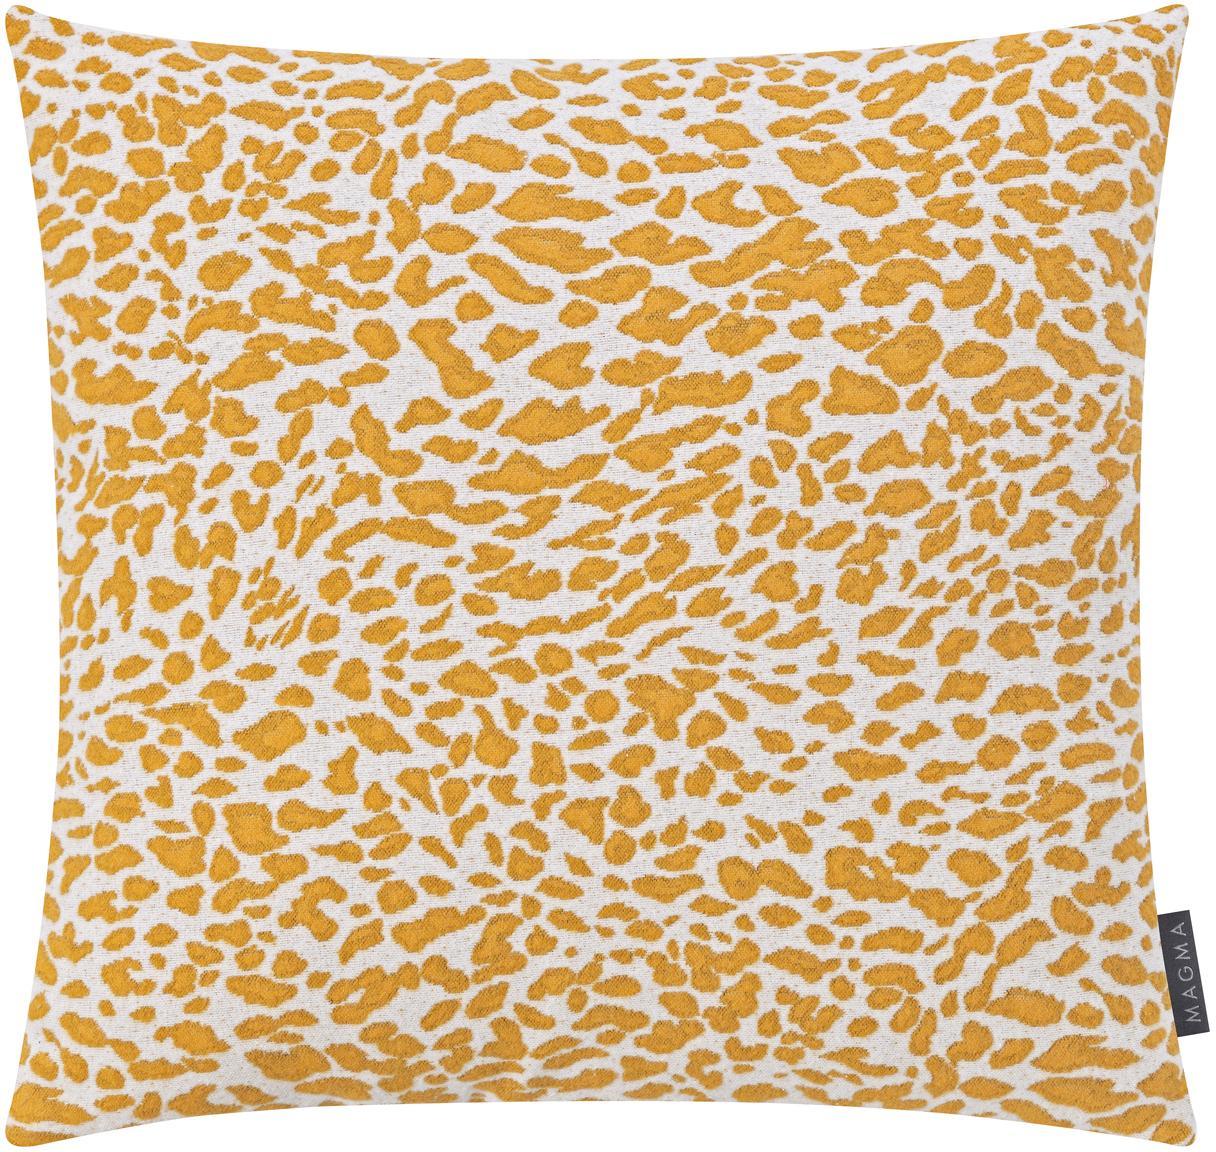 Federa arredo Leopardo, Tessuto: Jacquard, Giallo senape, bianco, Larg. 50 x Lung. 50 cm